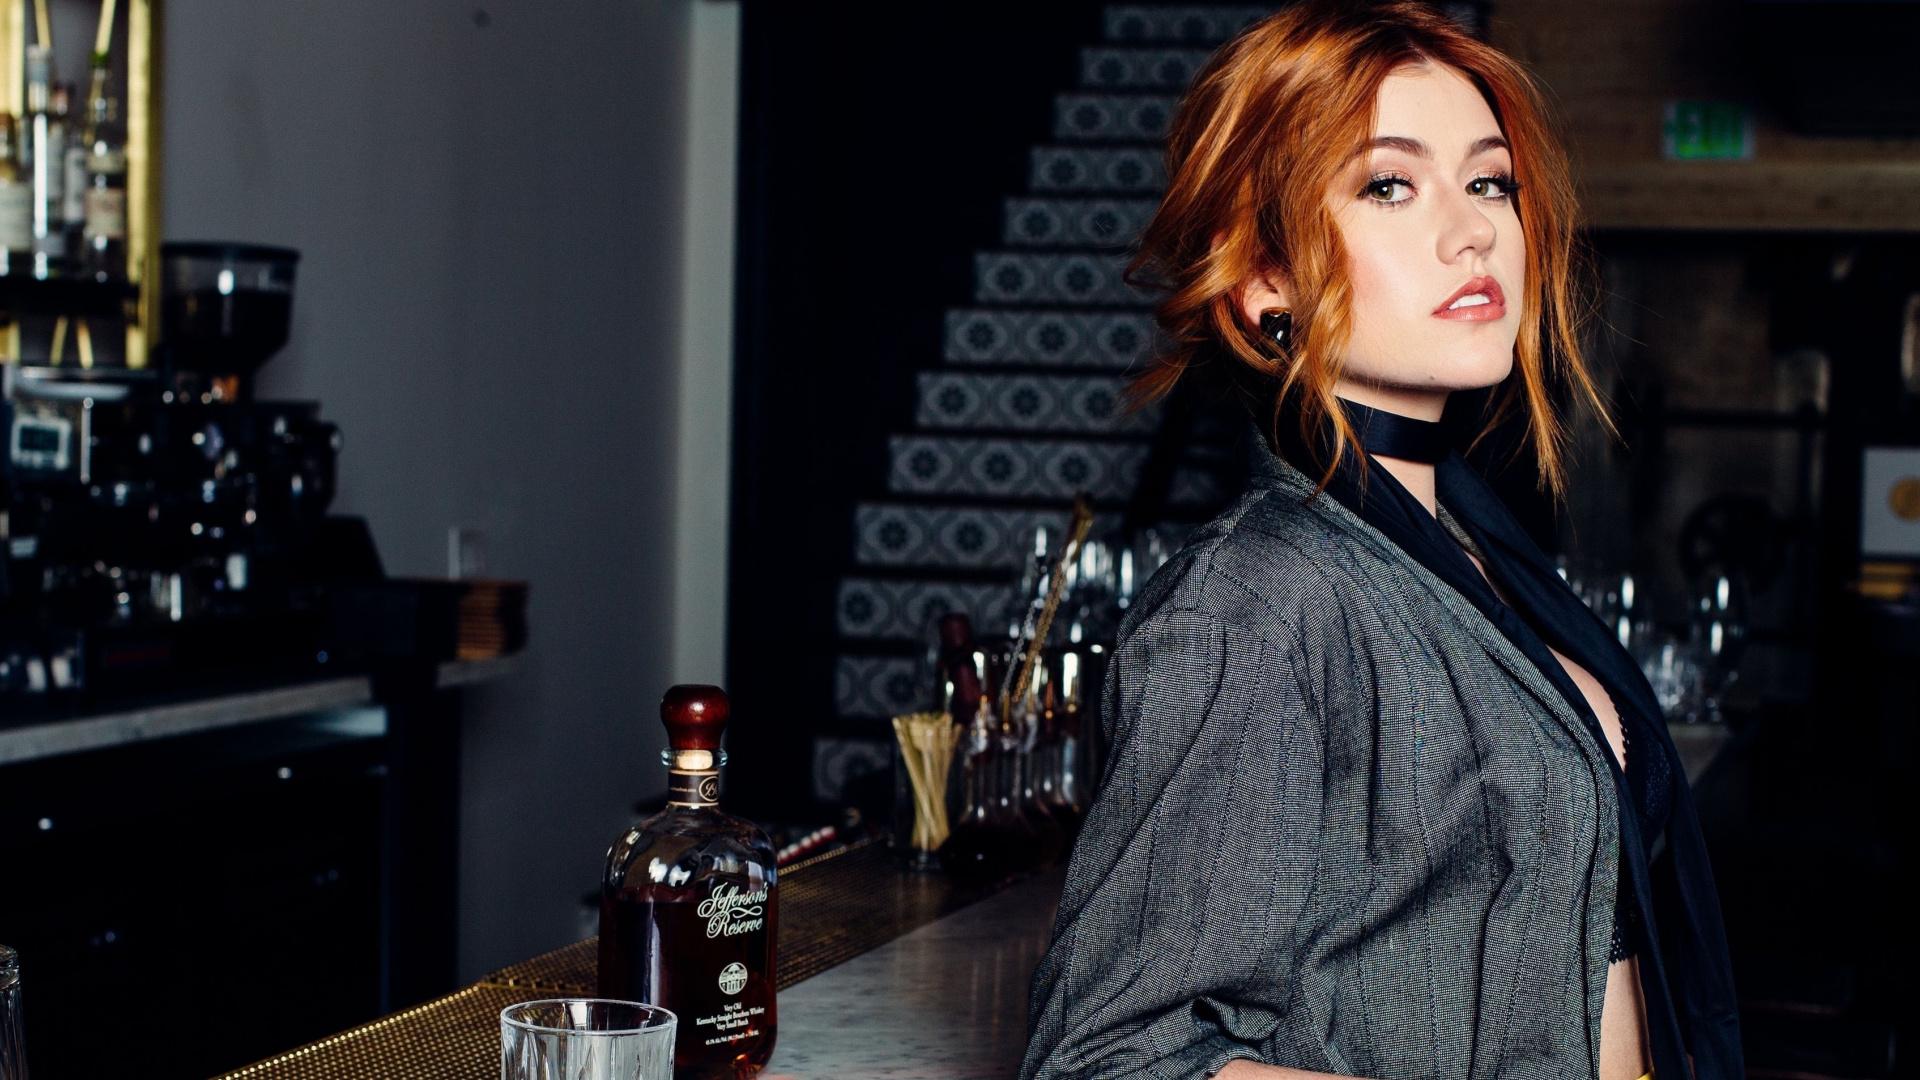 Wallpaper Katherine Mcnamara Actress Red Head Pub